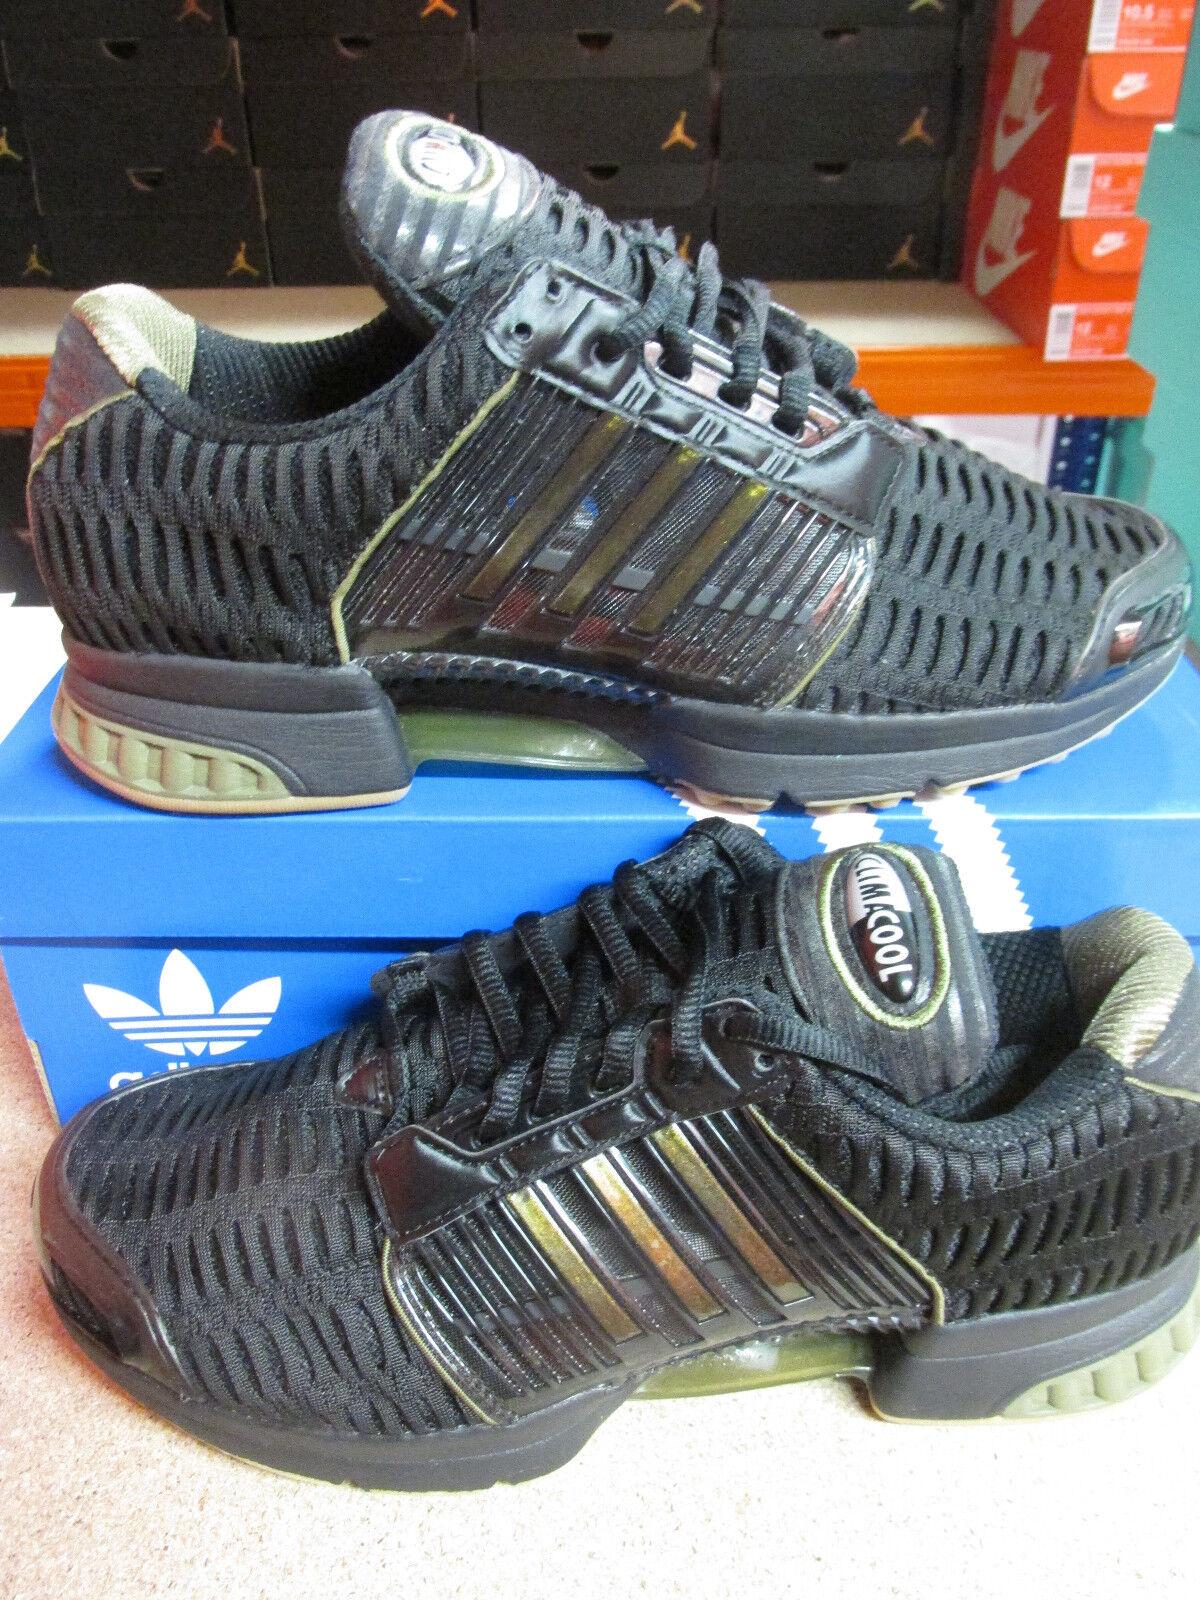 Adidas Originals Clima Cool 1 da uomo BB2794 RUNNING GINNASTICA Scarpe classiche da uomo